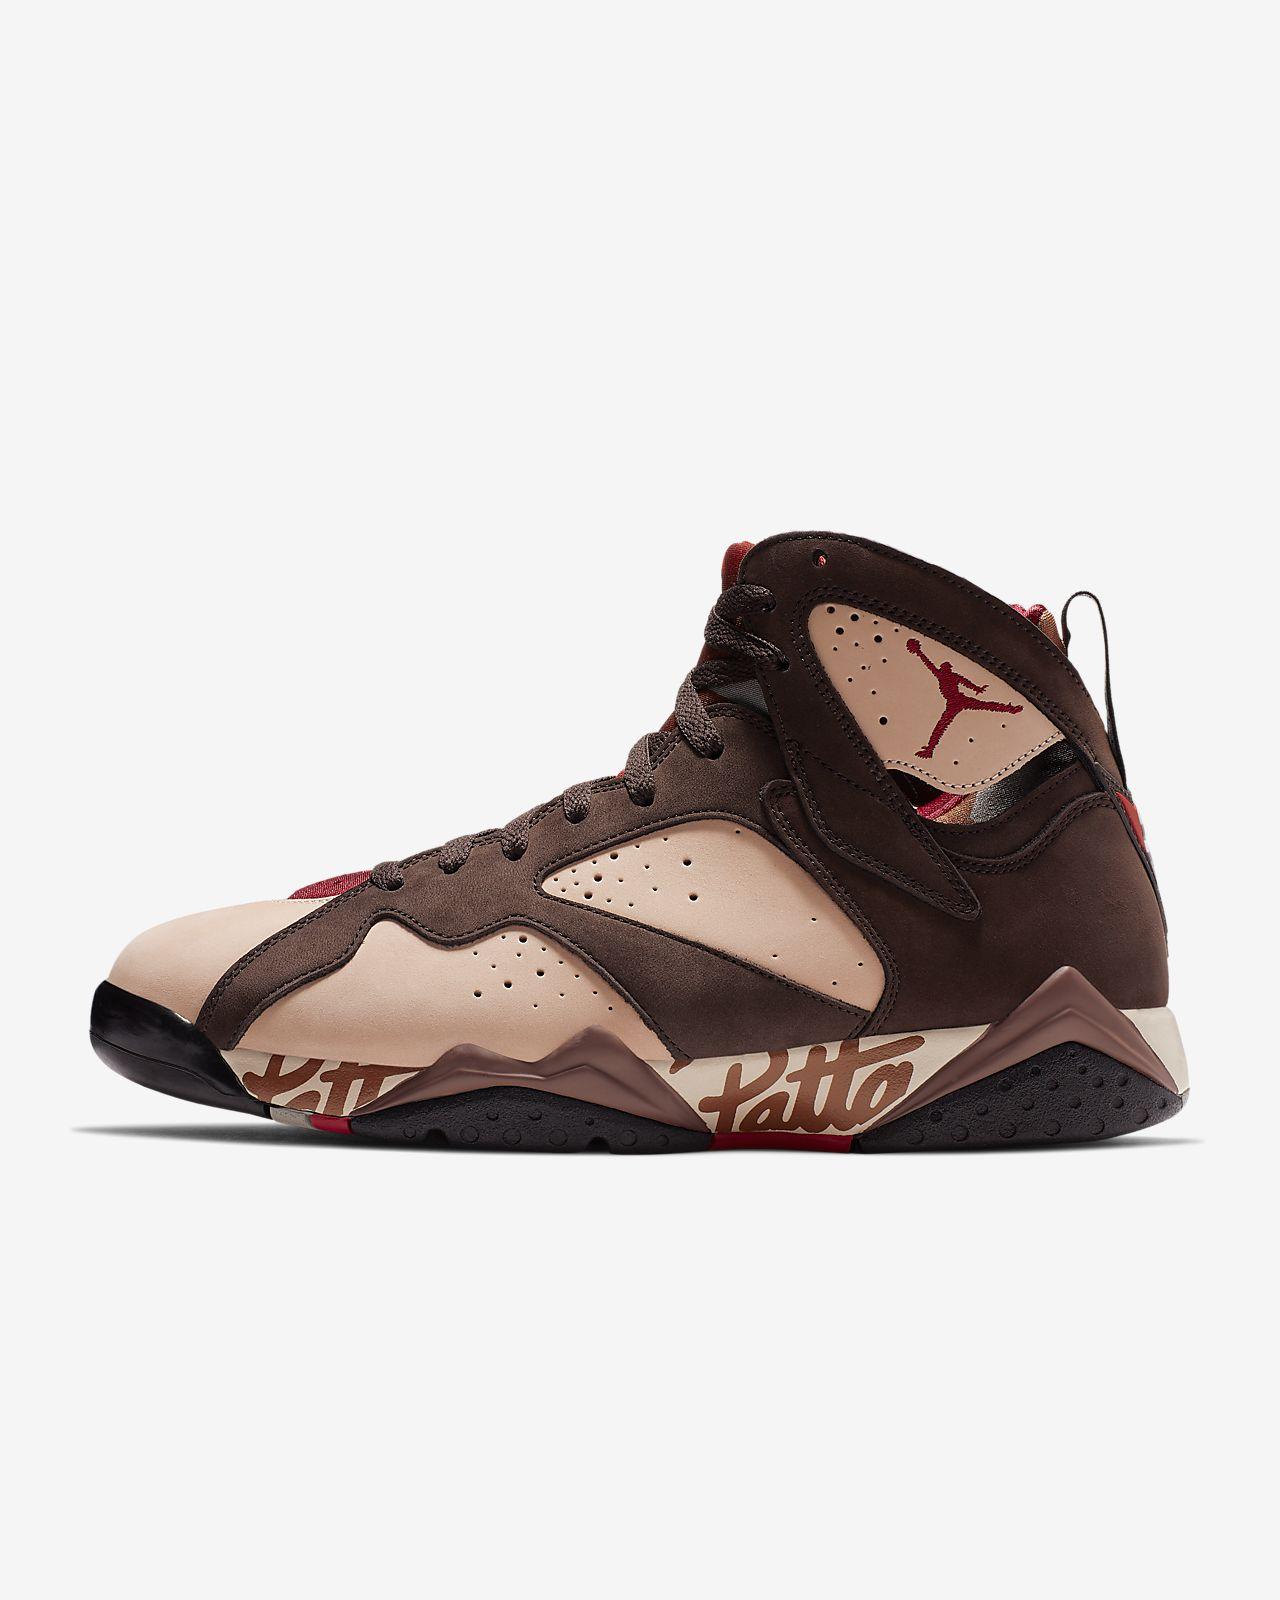 Air Jordan x Patta 7 Retro Men's Shoe